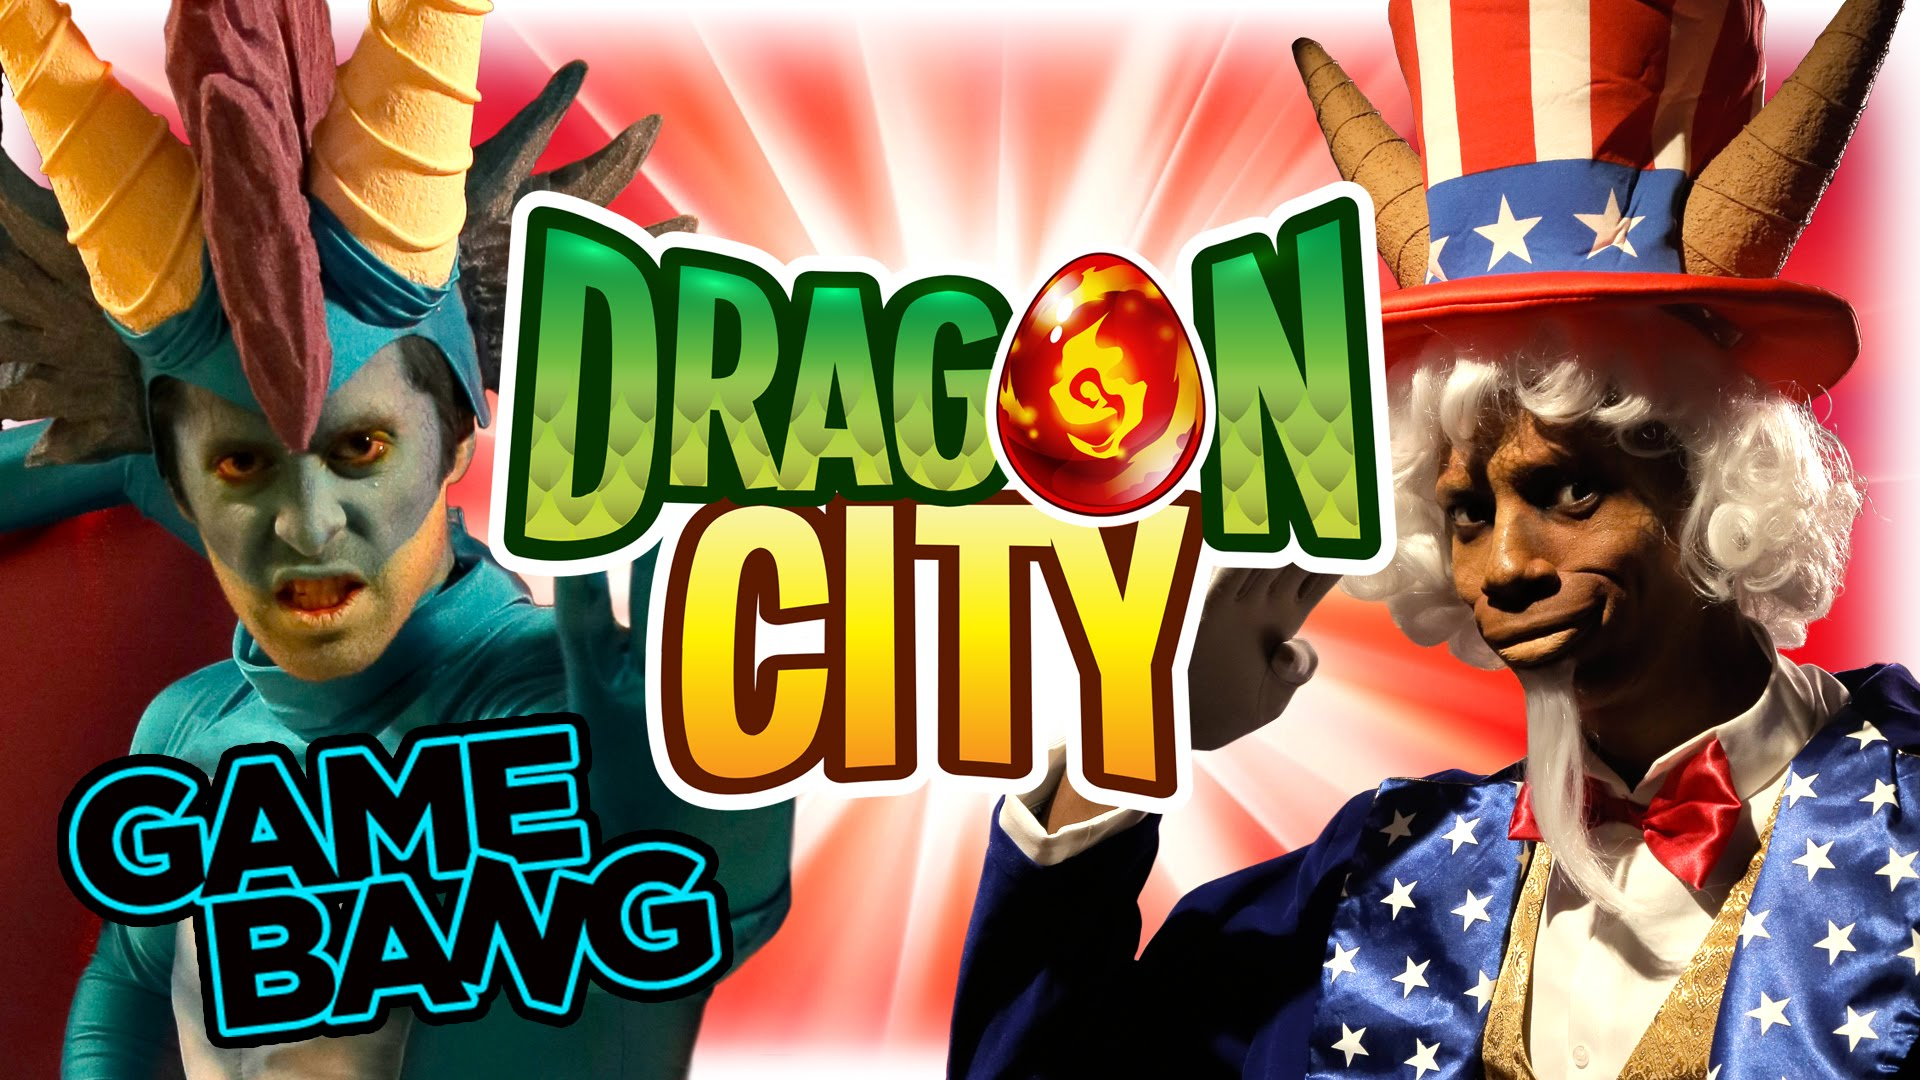 EPIC DRAGON CITY BATTLE CONCLUSION (Game Bang)